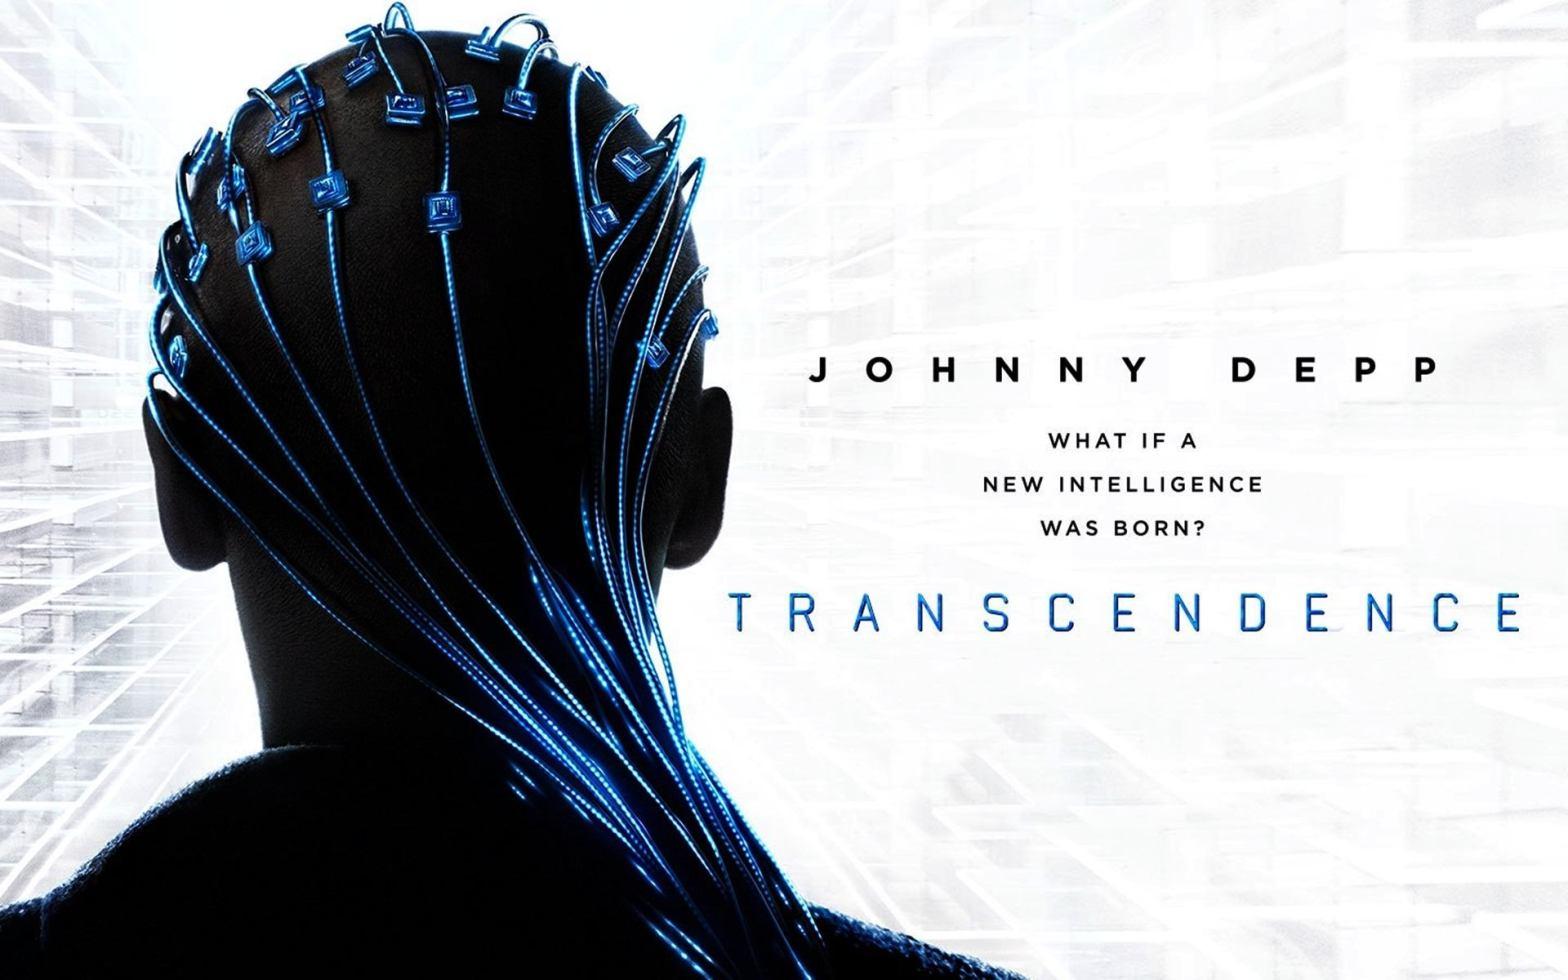 Transcendence promotes technology as the world's savior.